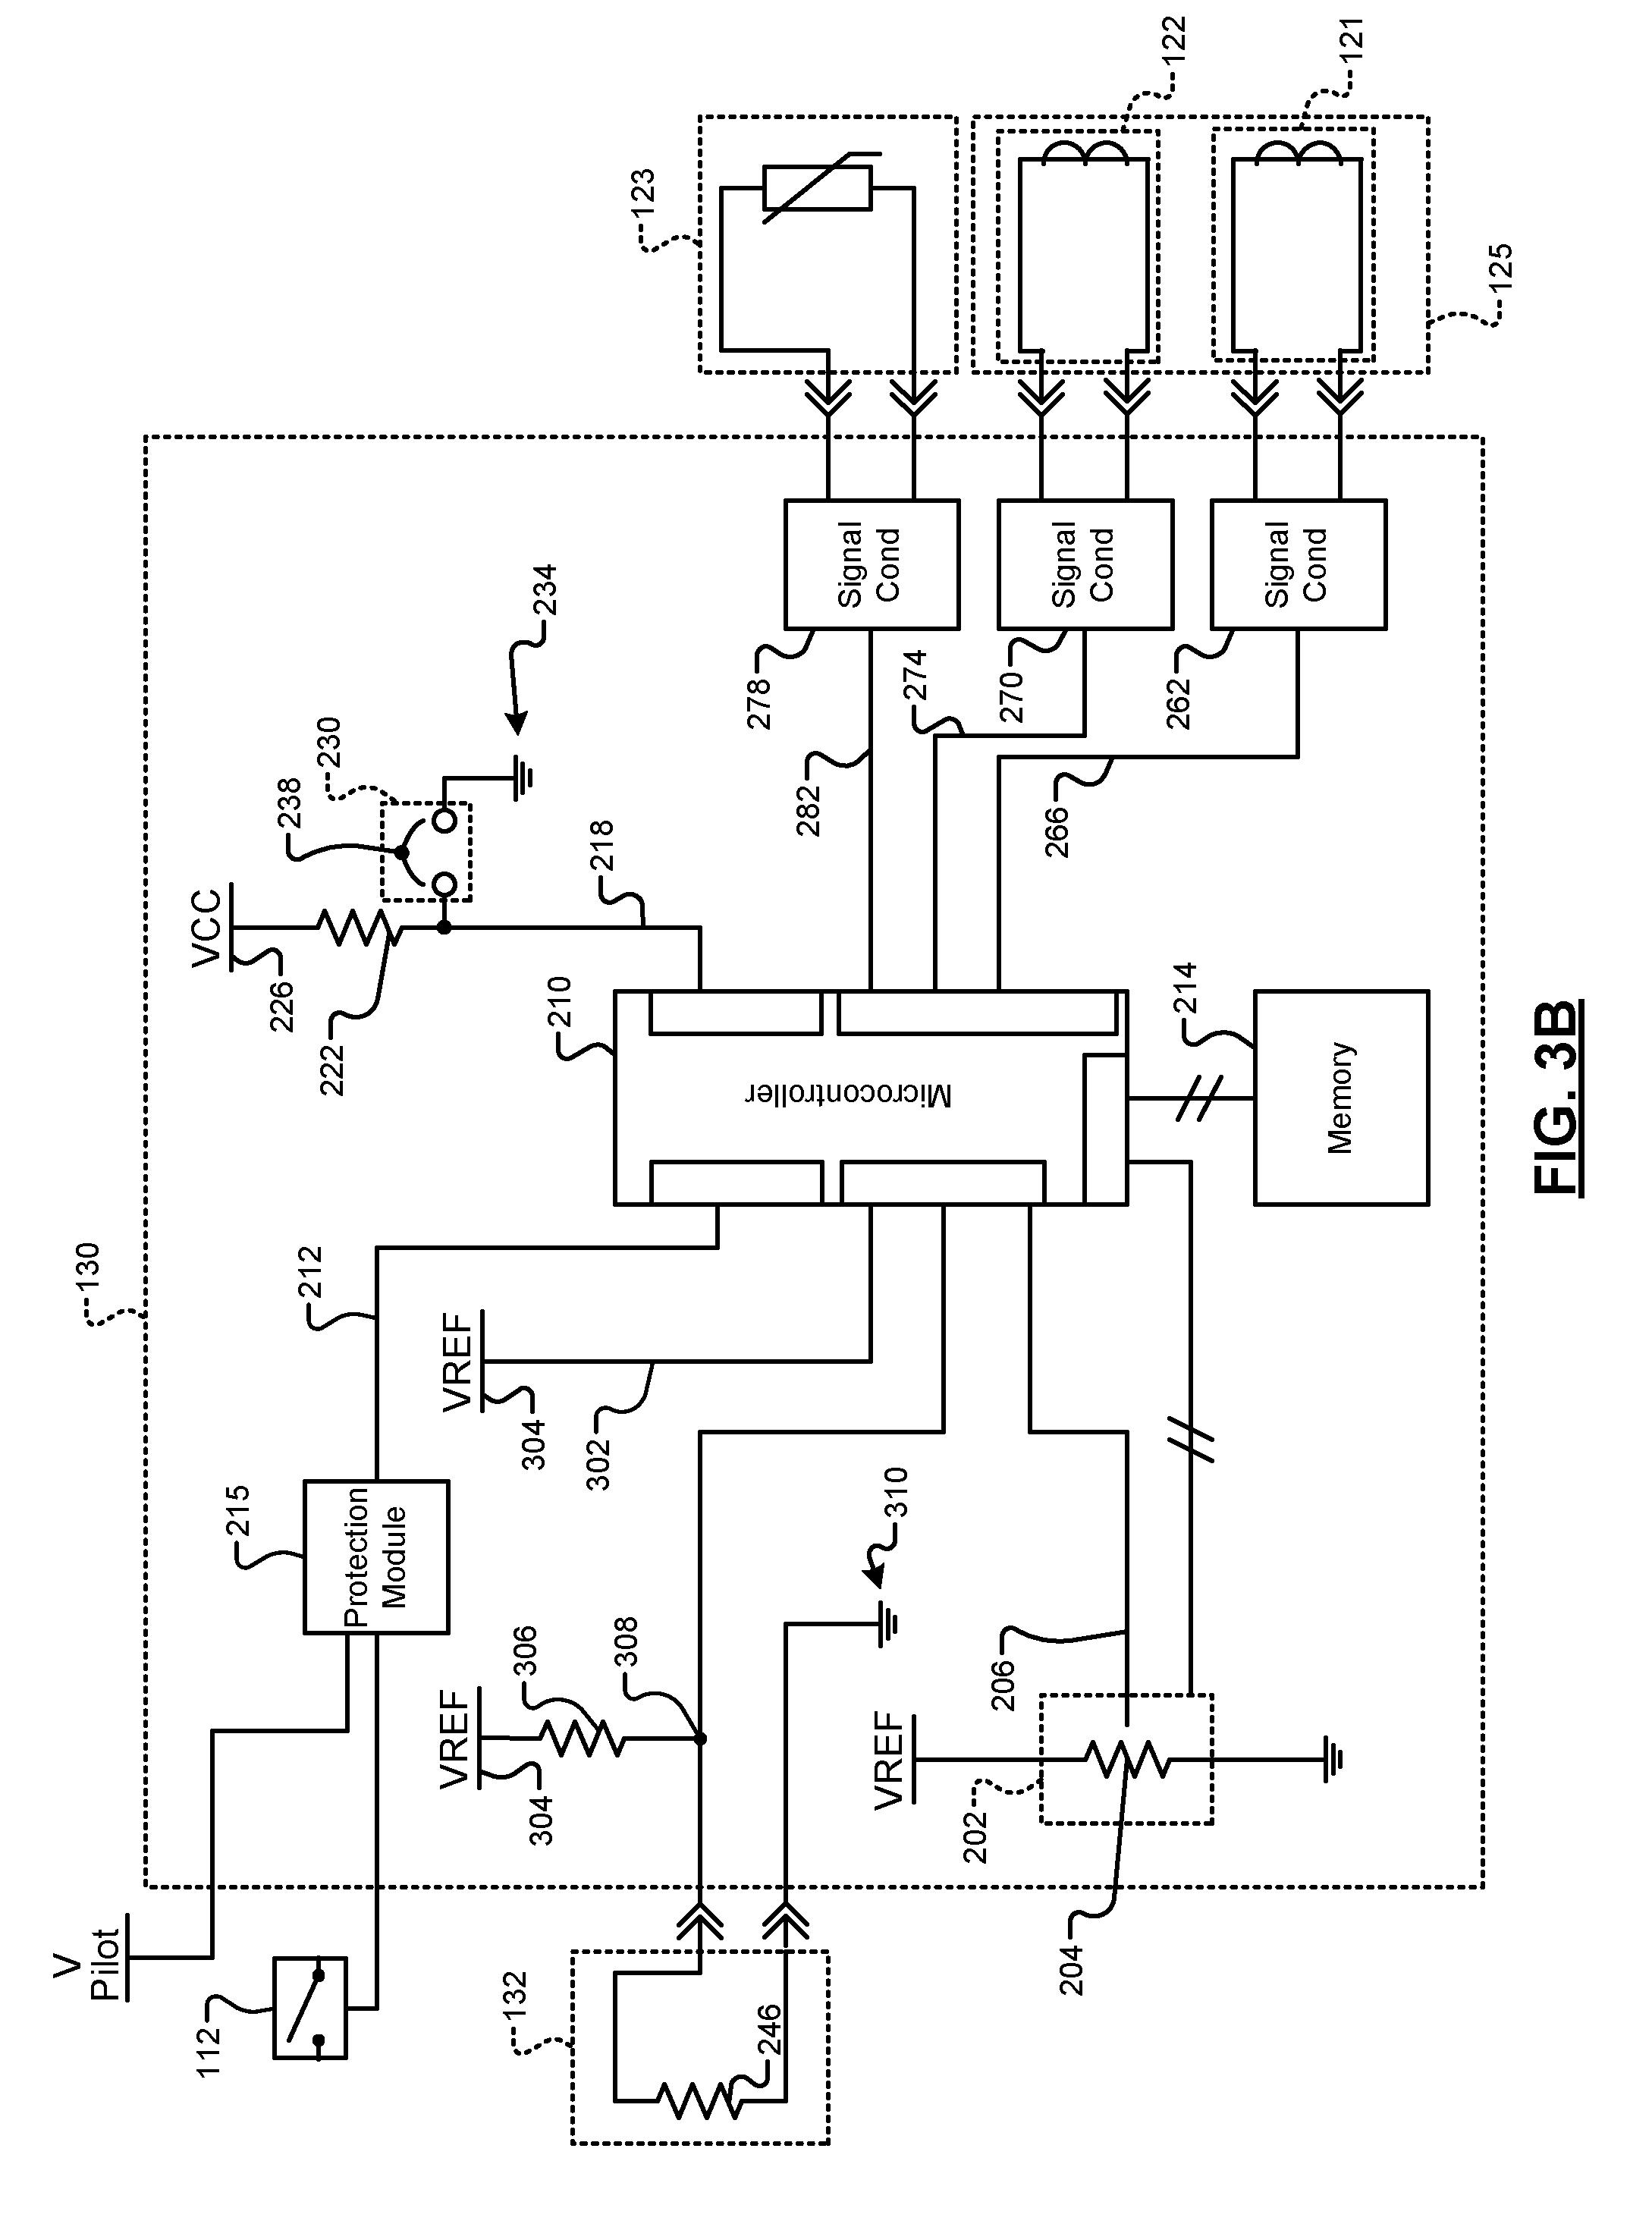 borg warner furnace blower wiring diagram